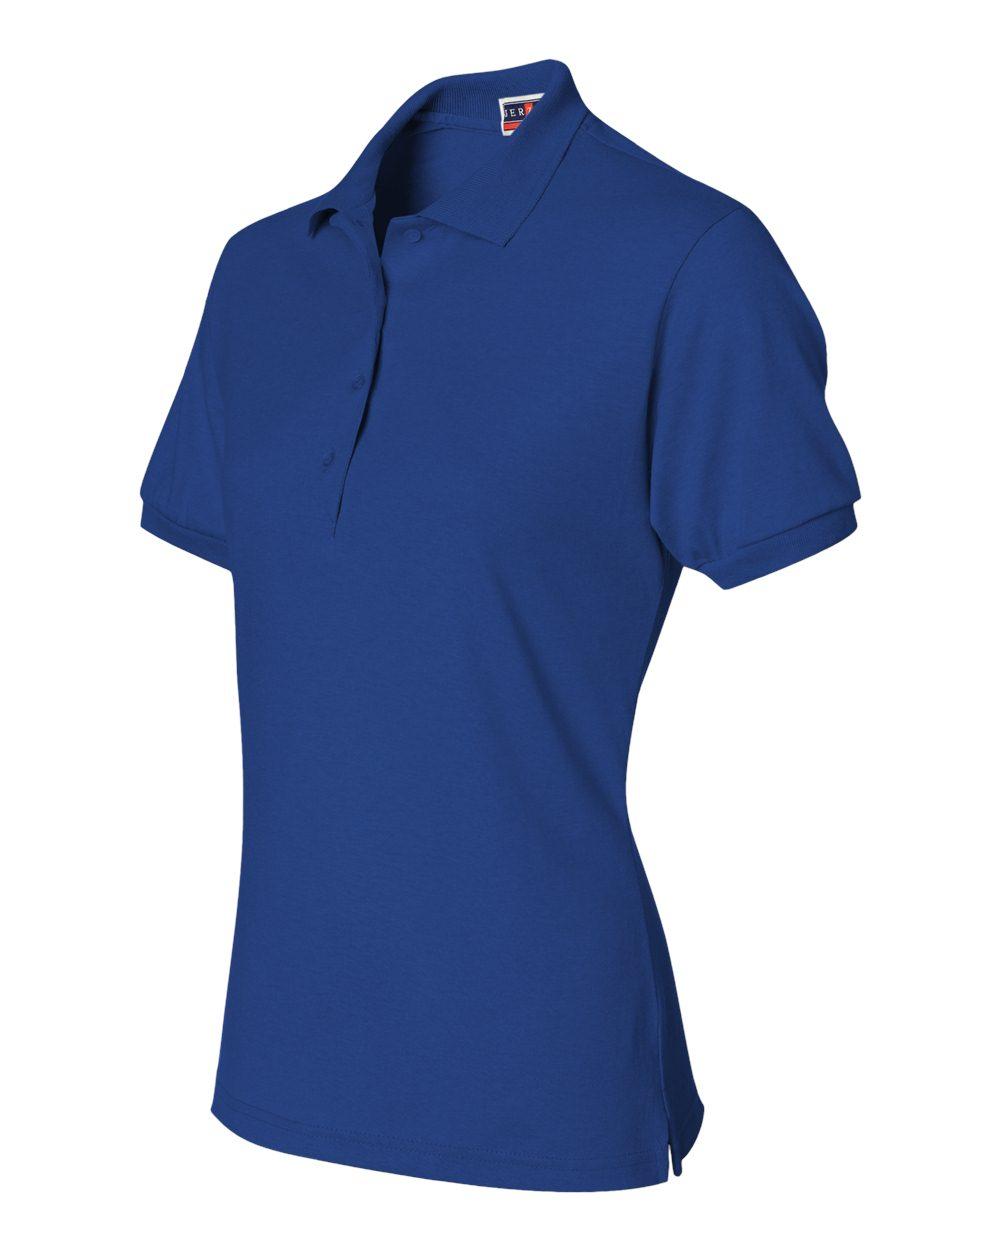 Jerzees-Women-039-s-5-6-oz-50-50-Jersey-Polo-with-SpotShield-437W-S-2XL thumbnail 9